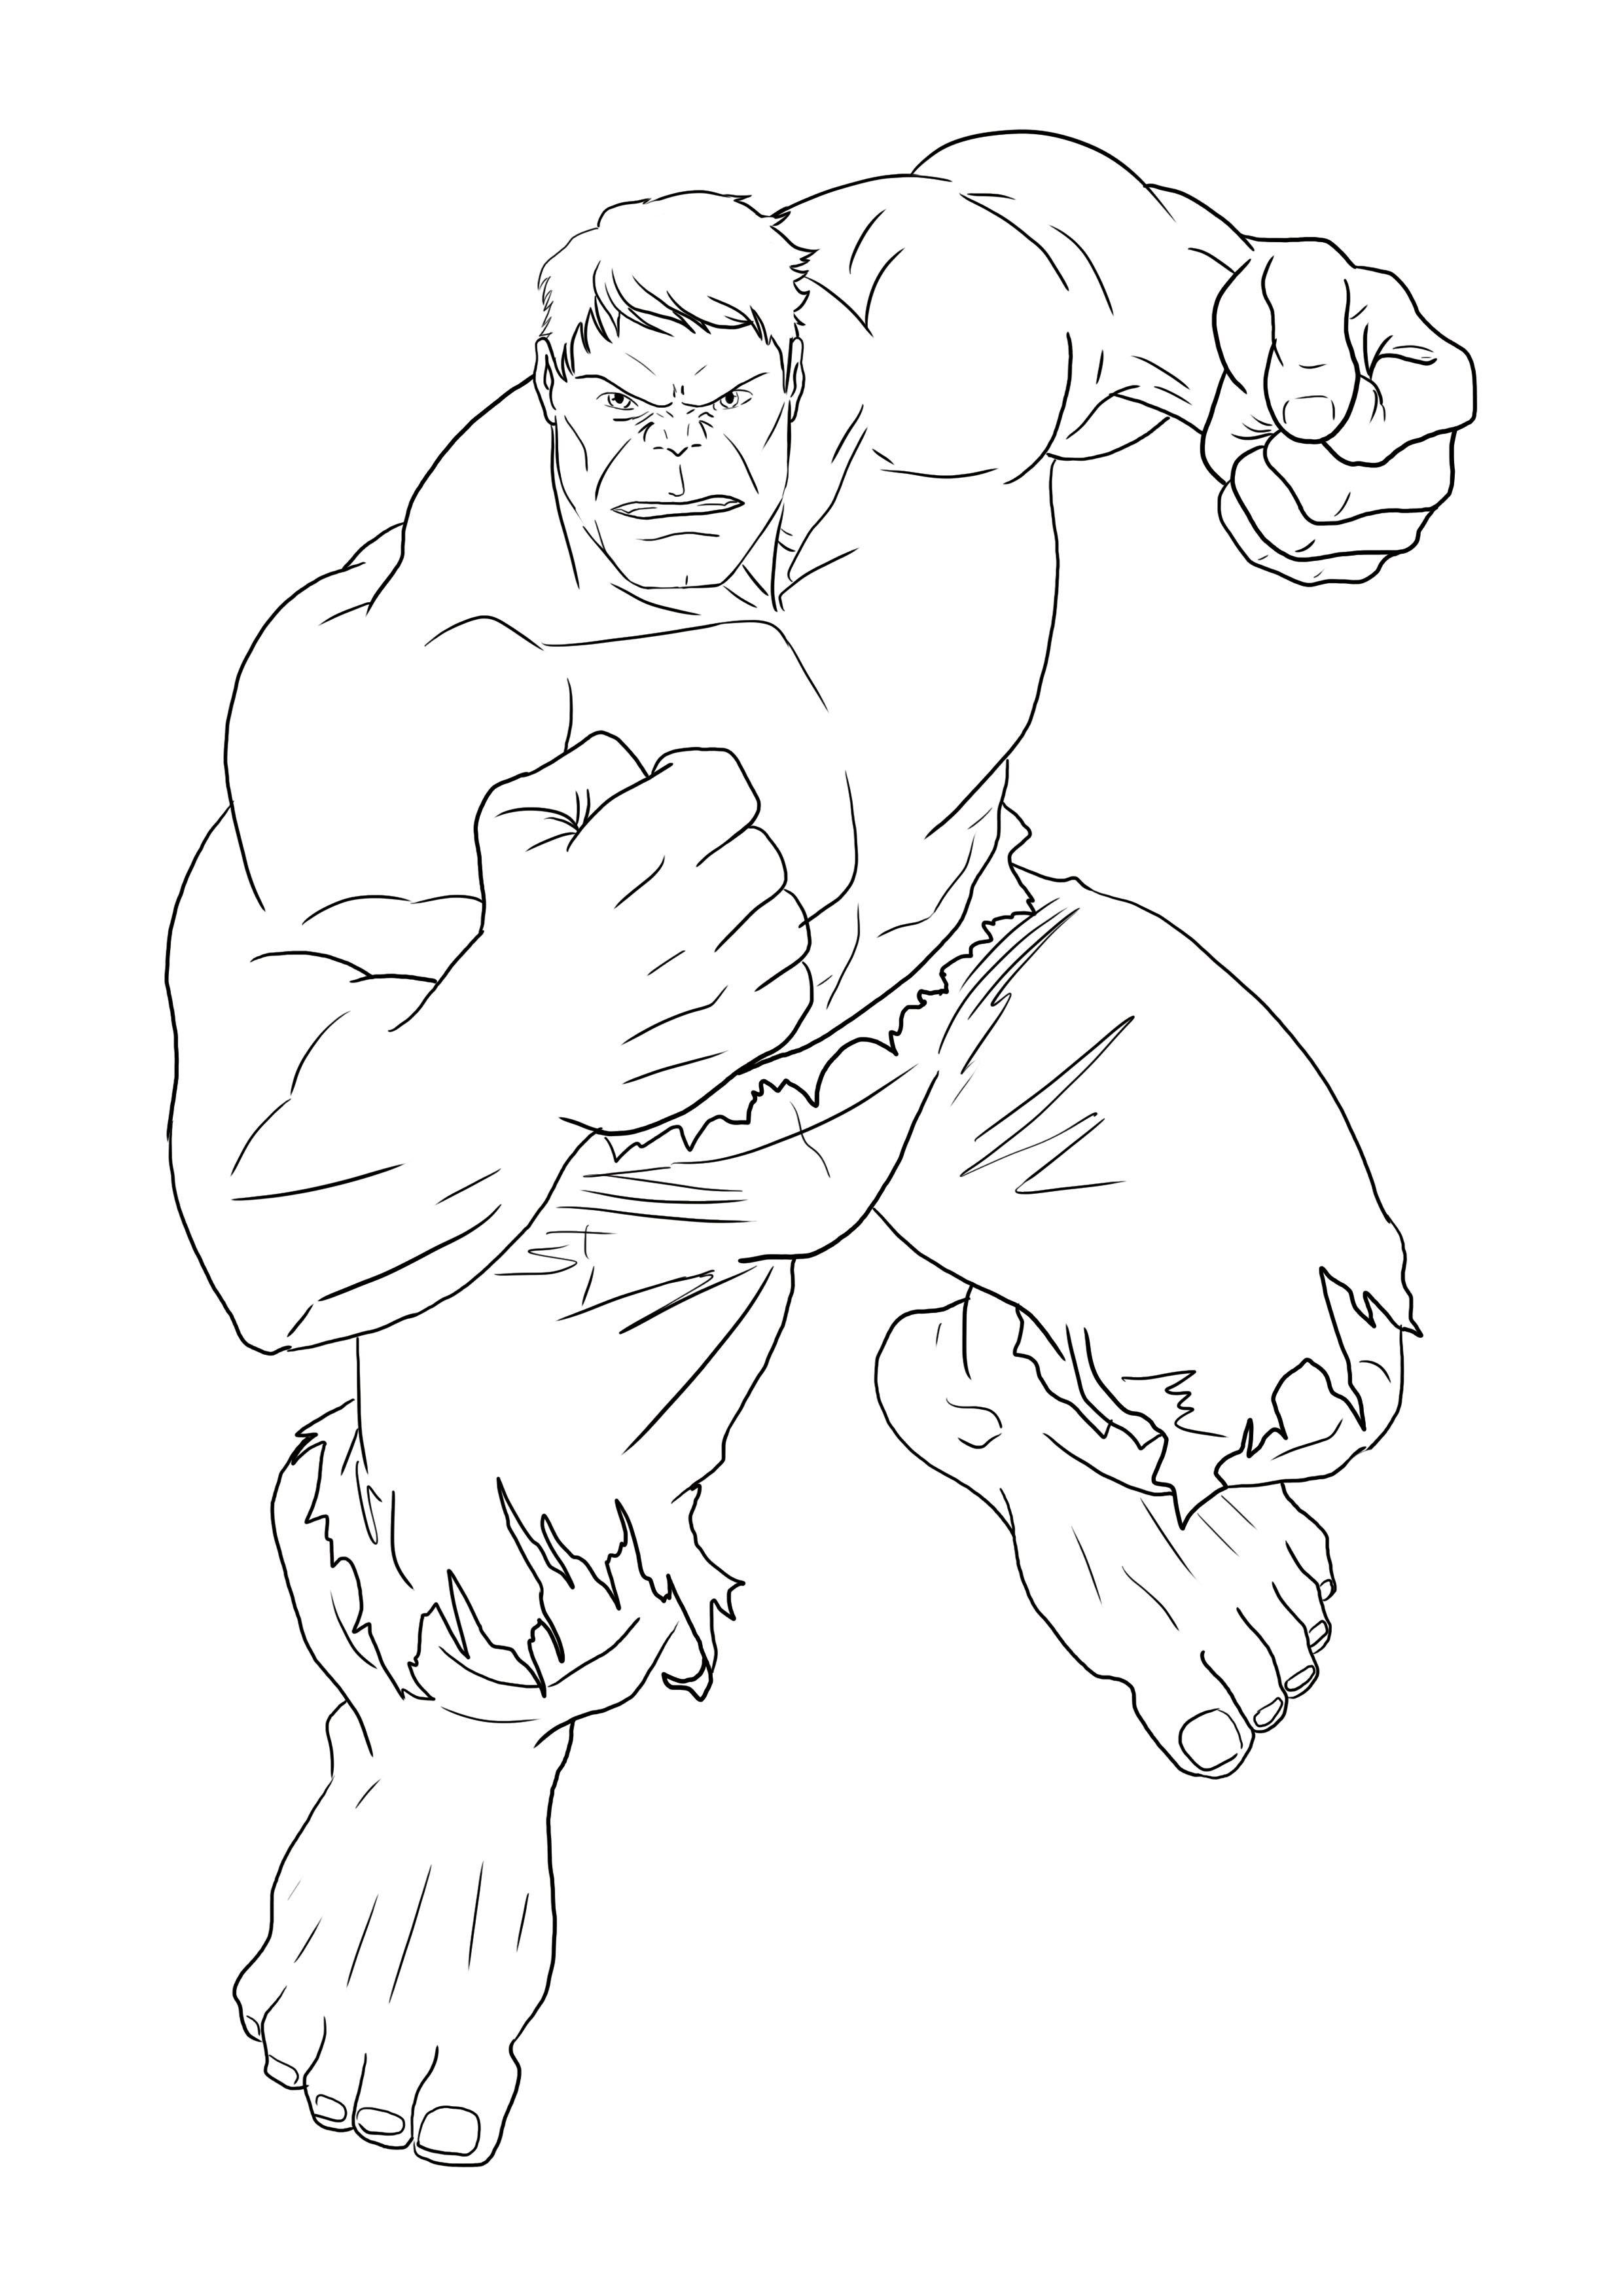 Realiser Un Dessin De Hulk Dessin Hulk Coloriage Hulk Coloriage Super Heros